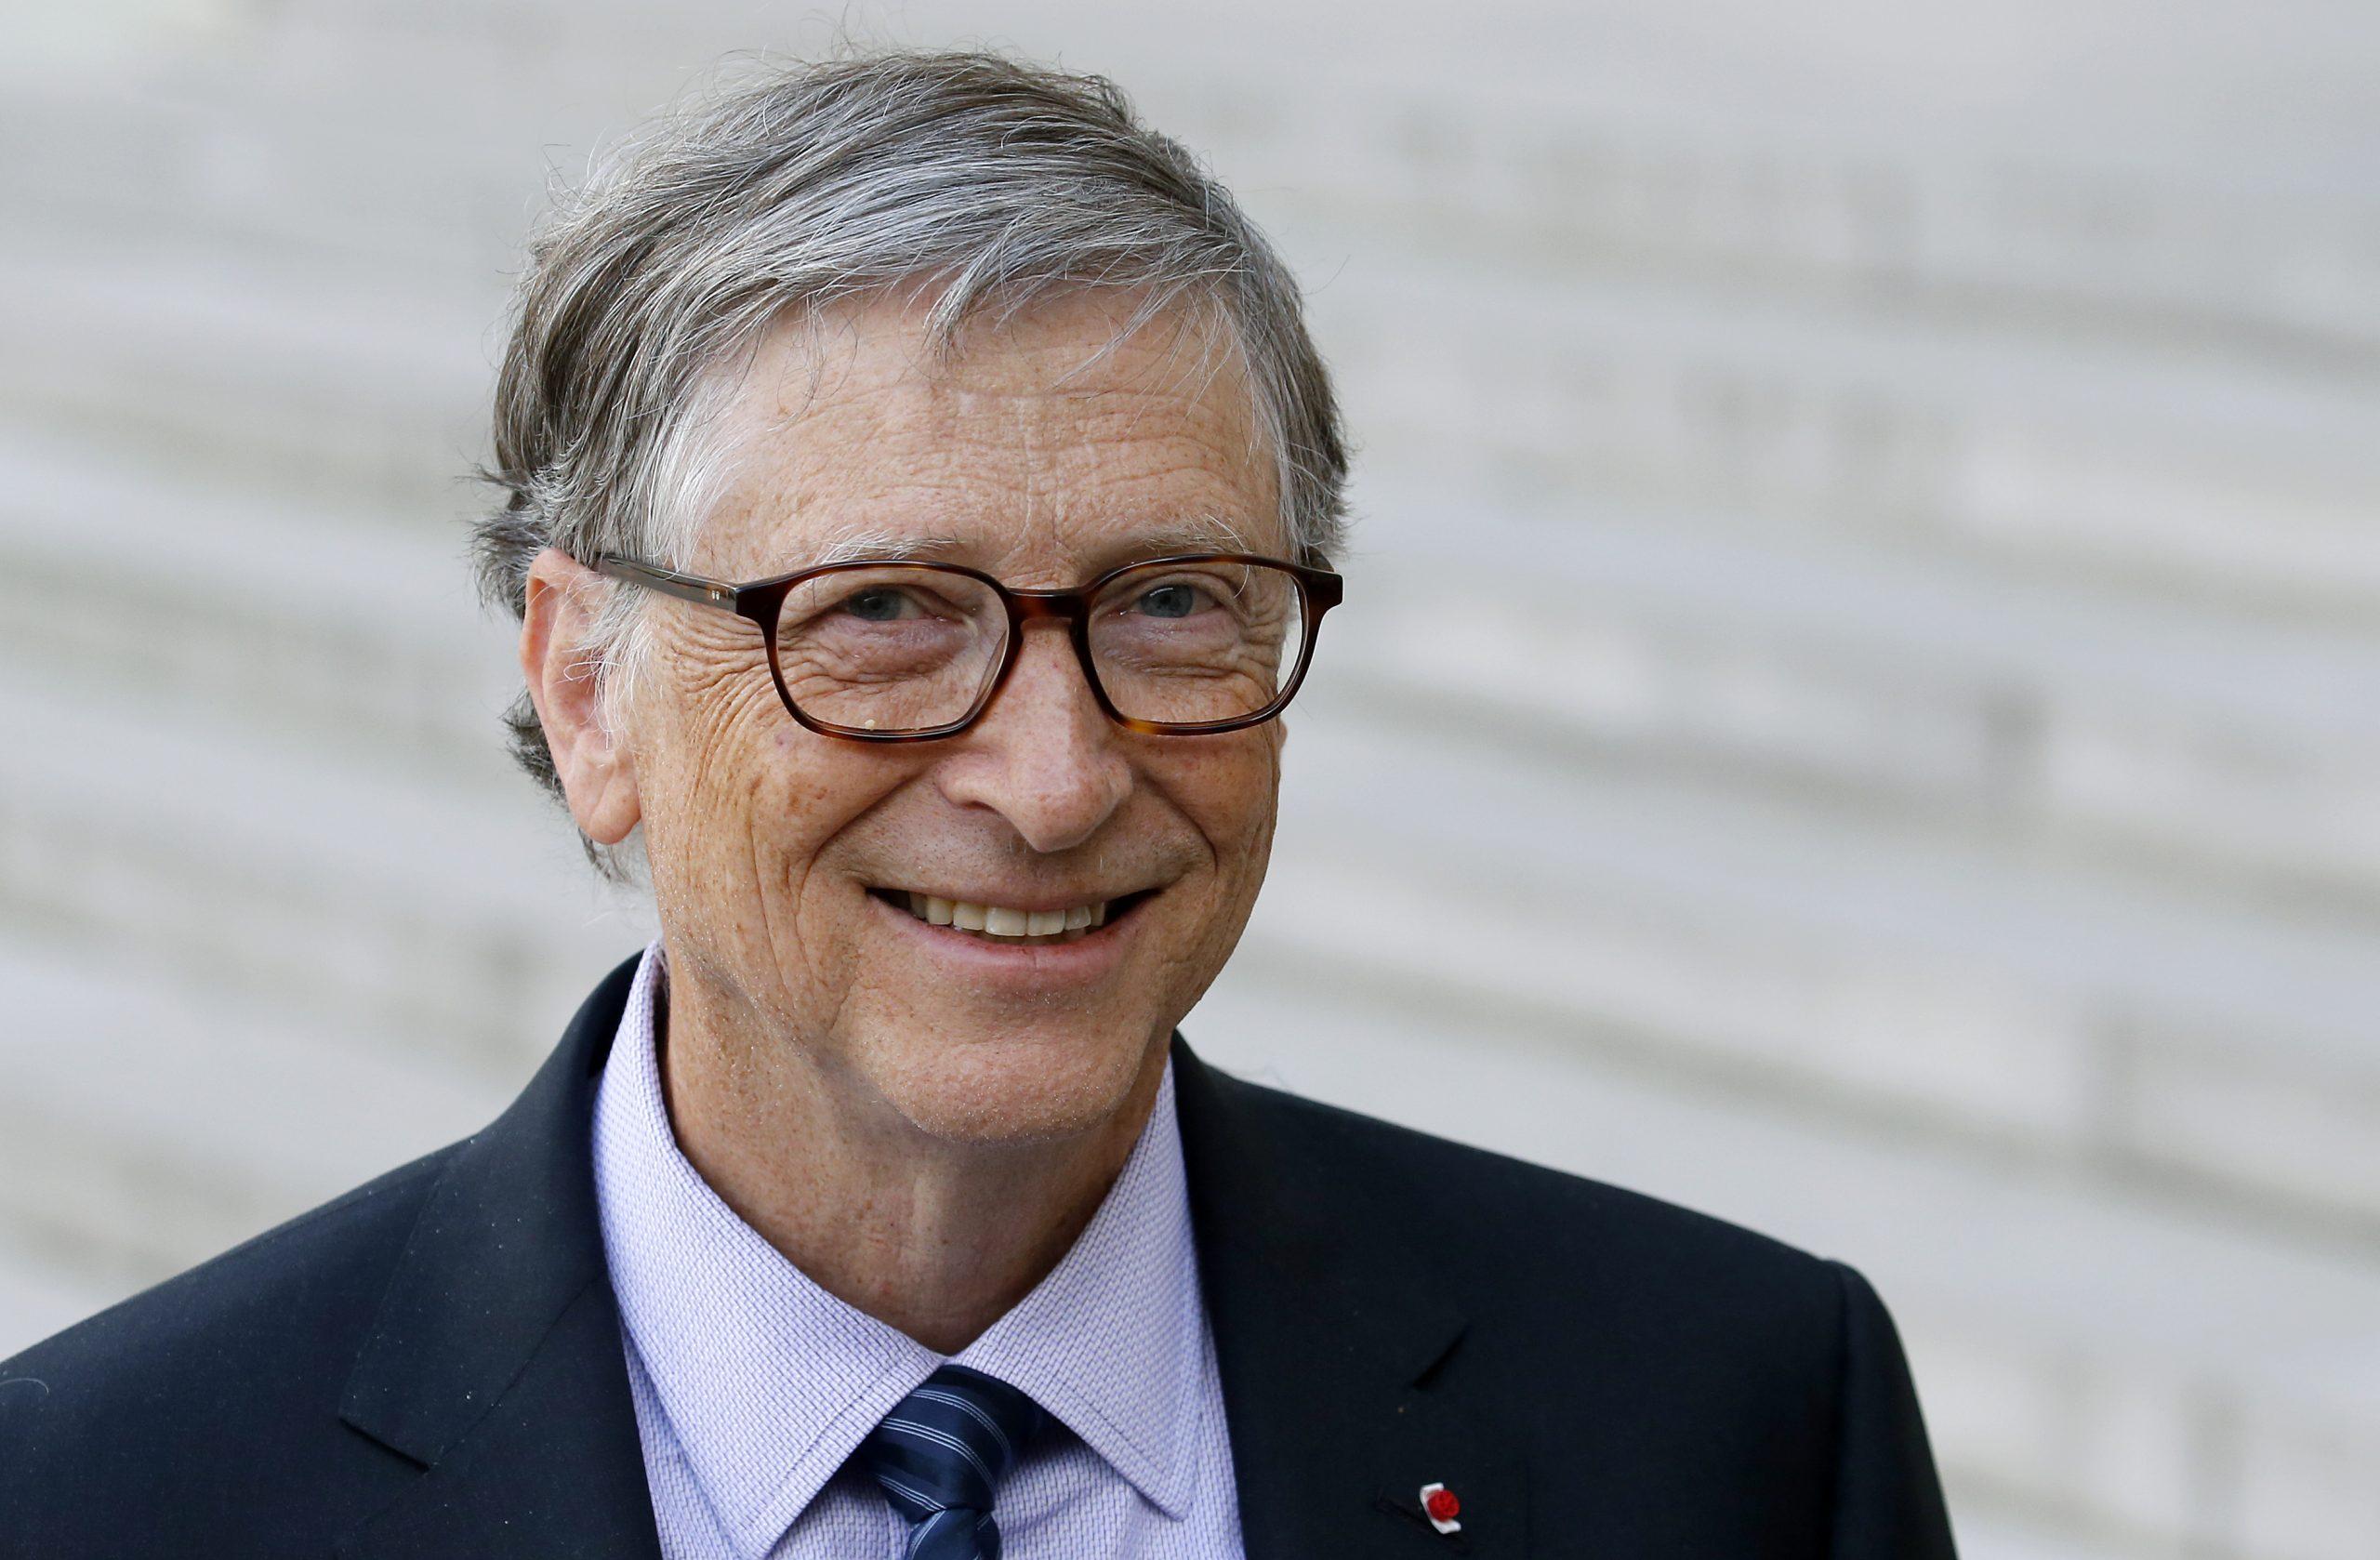 Empreendedores de sucesso - Bill Gates